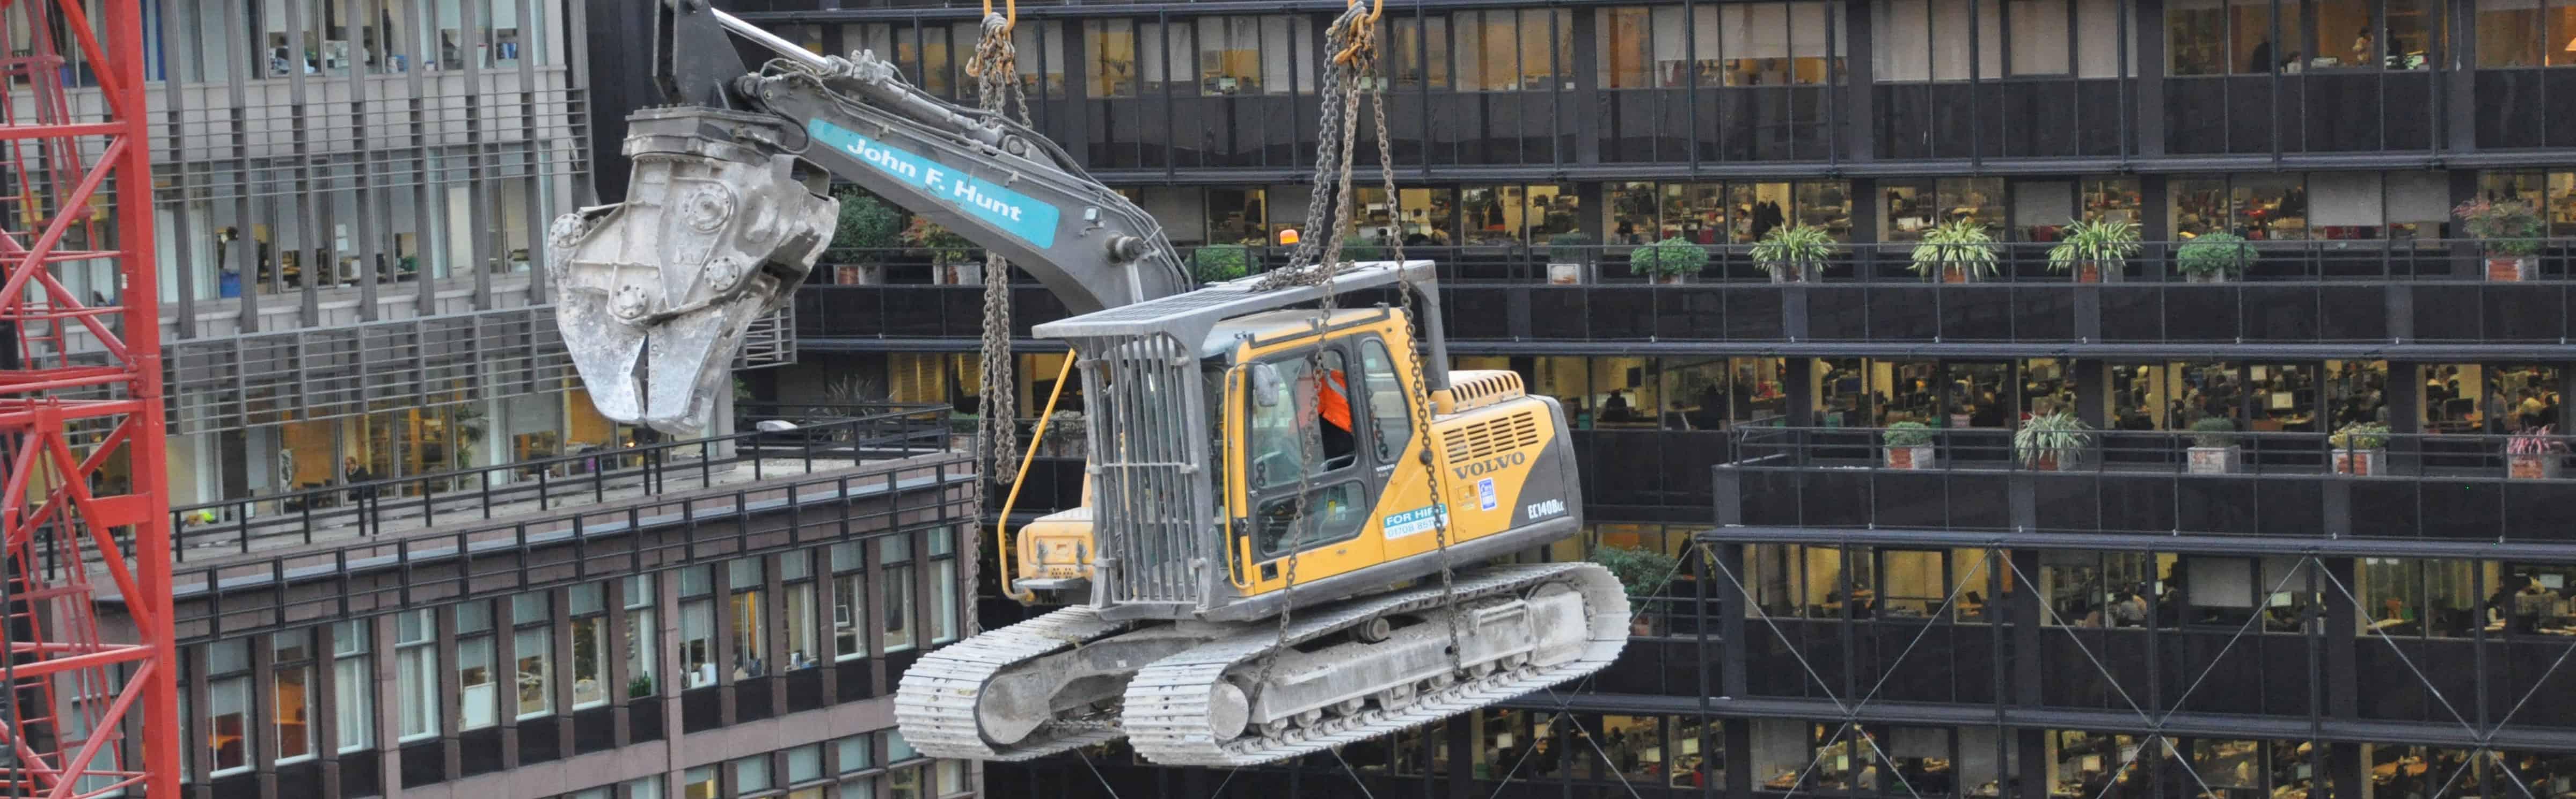 London Lifting Gear Hire and Testing Company UK | Thameside